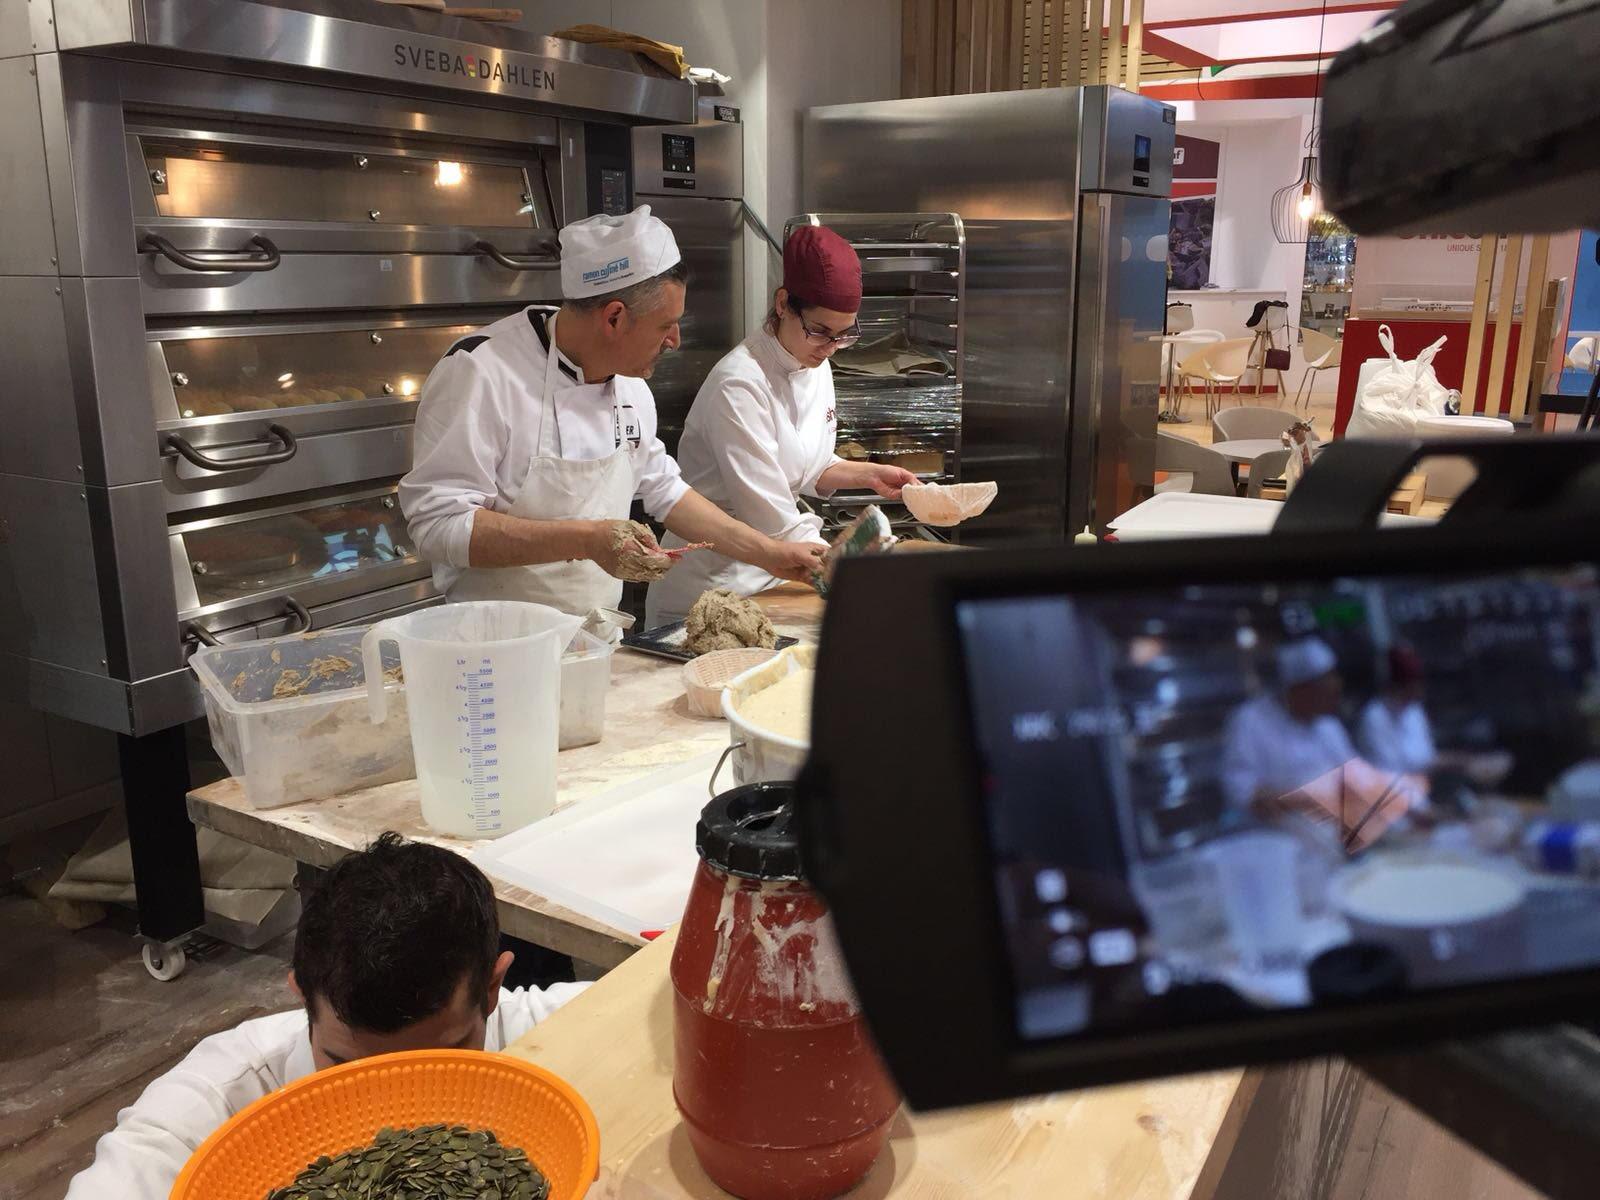 alimentaria videolab video foto